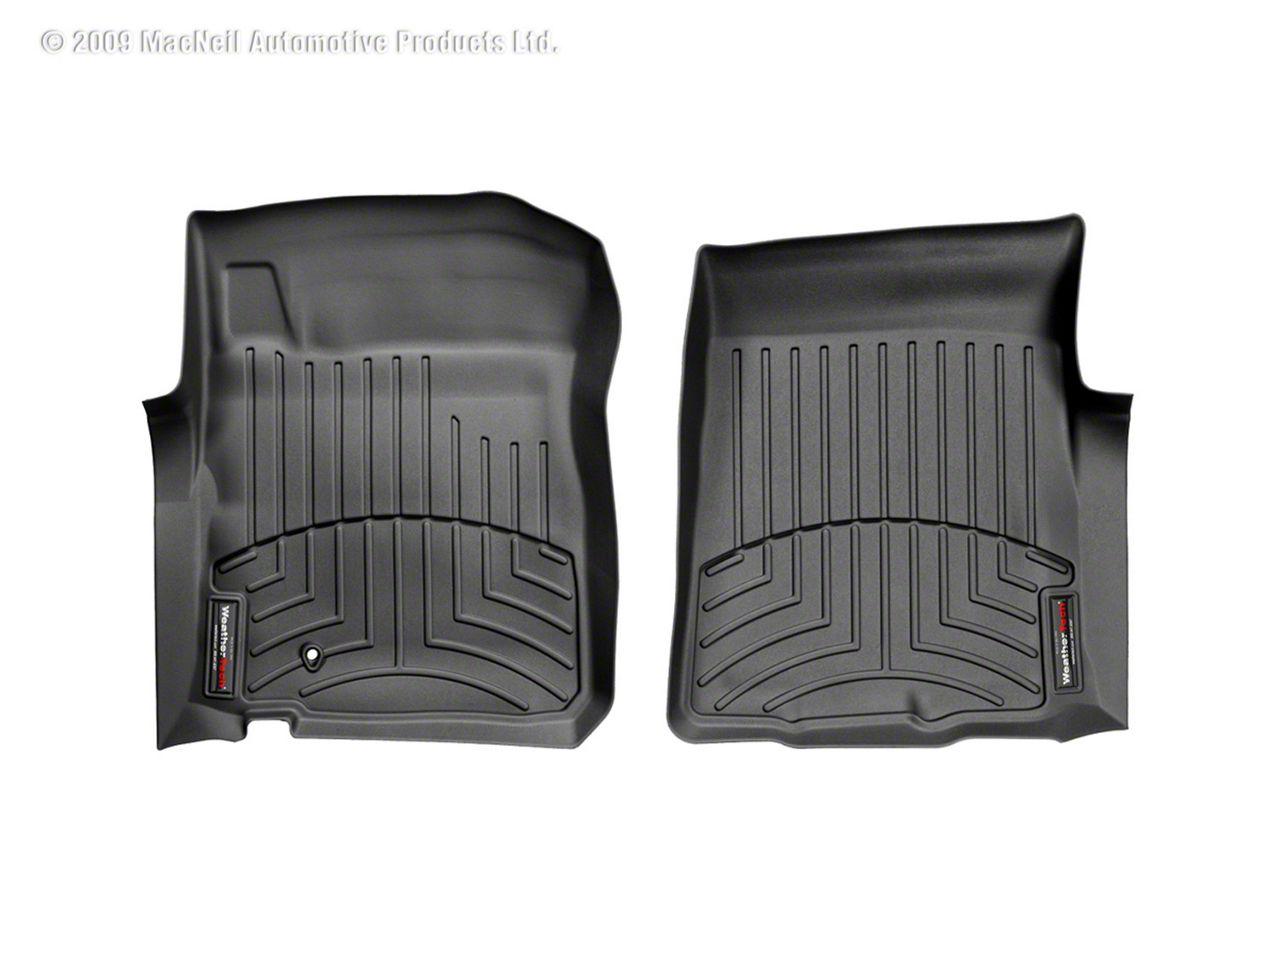 Weathertech DigitalFit Front & Rear Floor Liners - Black (00-03 F-150 SuperCab)